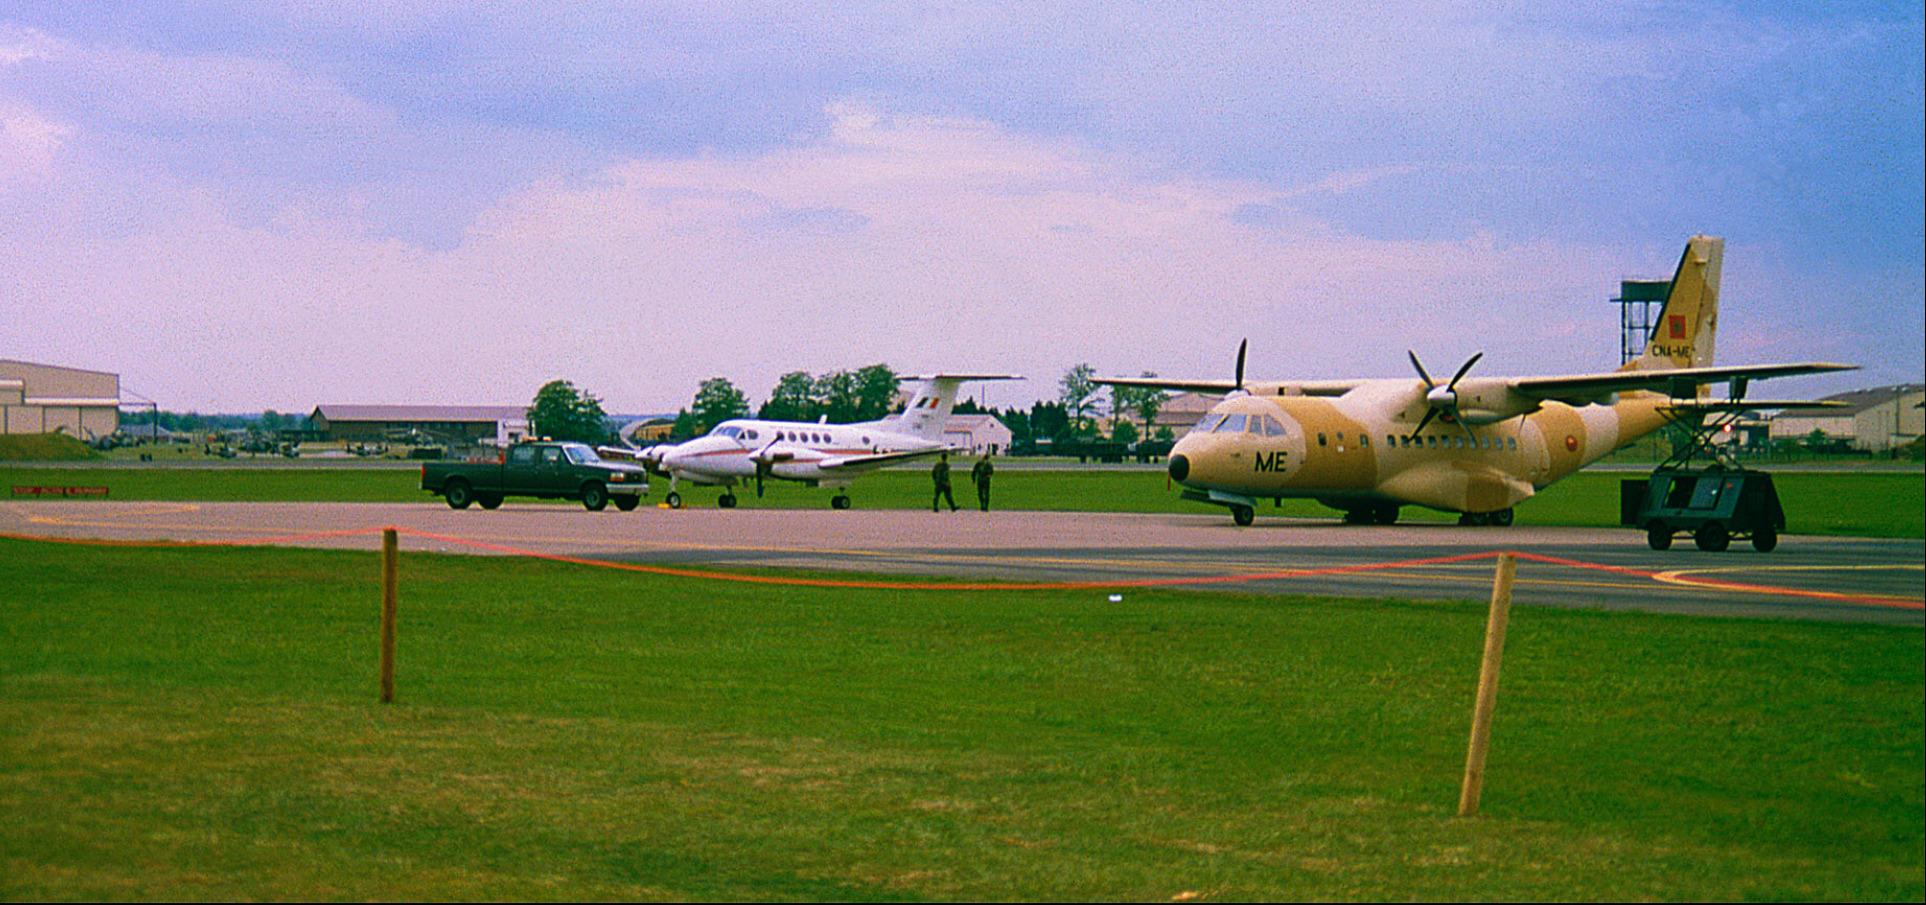 FRA: Photos d'avions de transport - Page 42 5cdb1b10